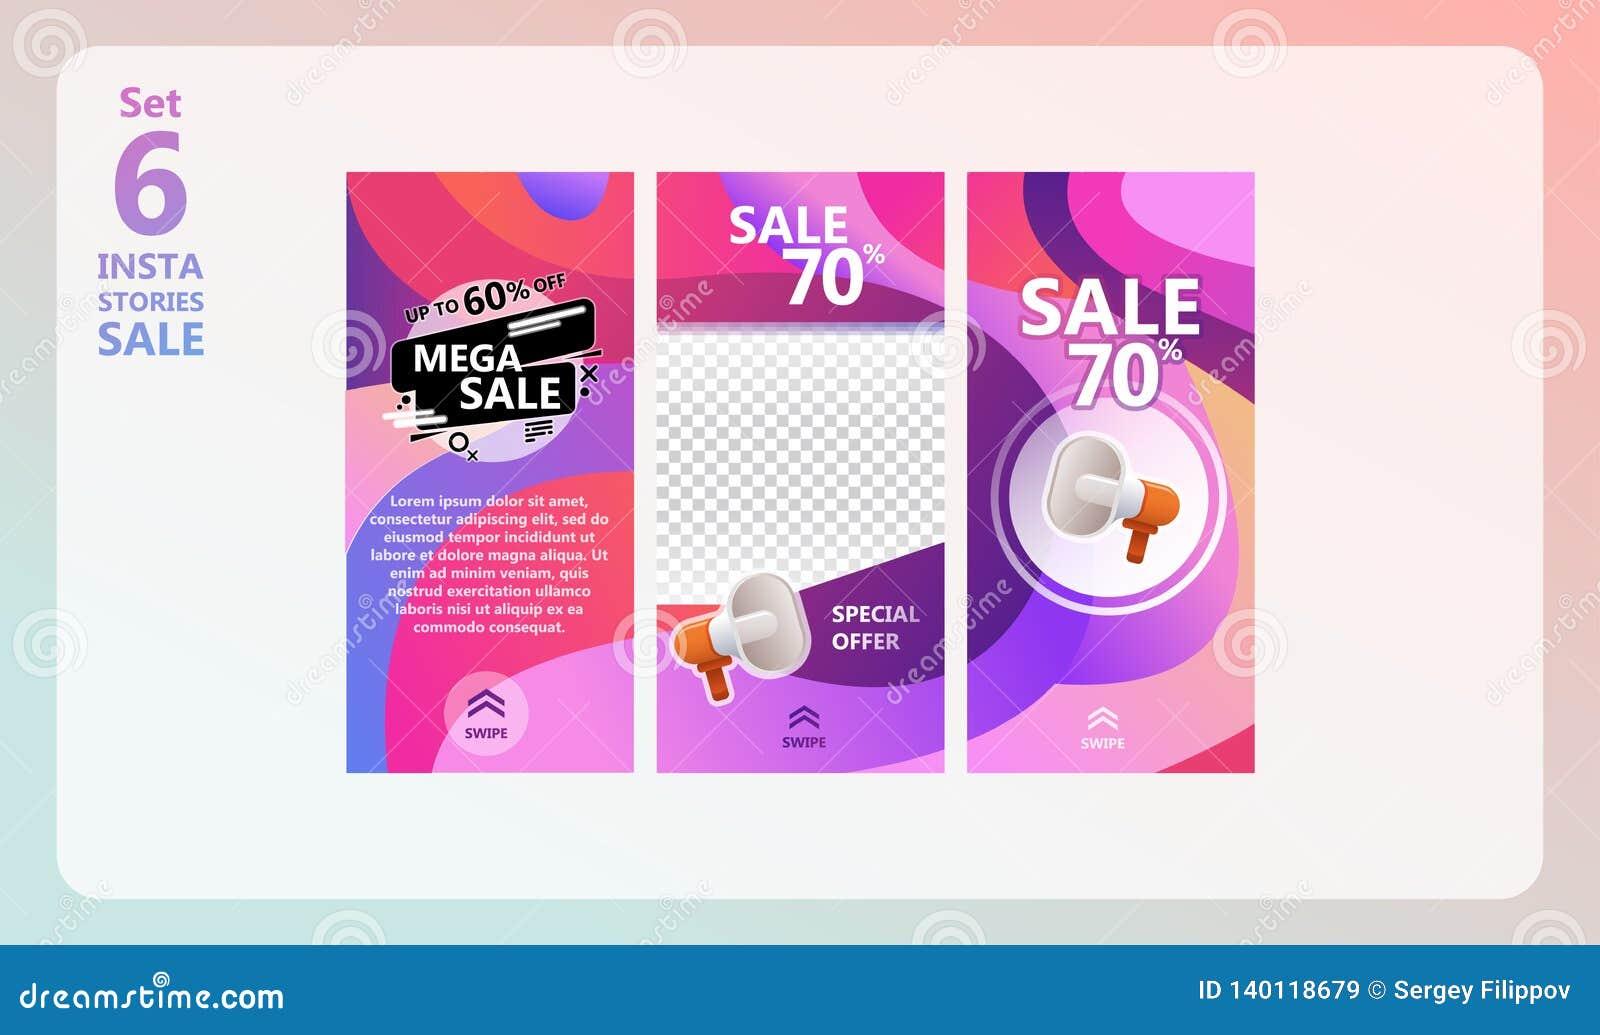 Instagram Stories Sale Set  Stock Vector - Illustration of